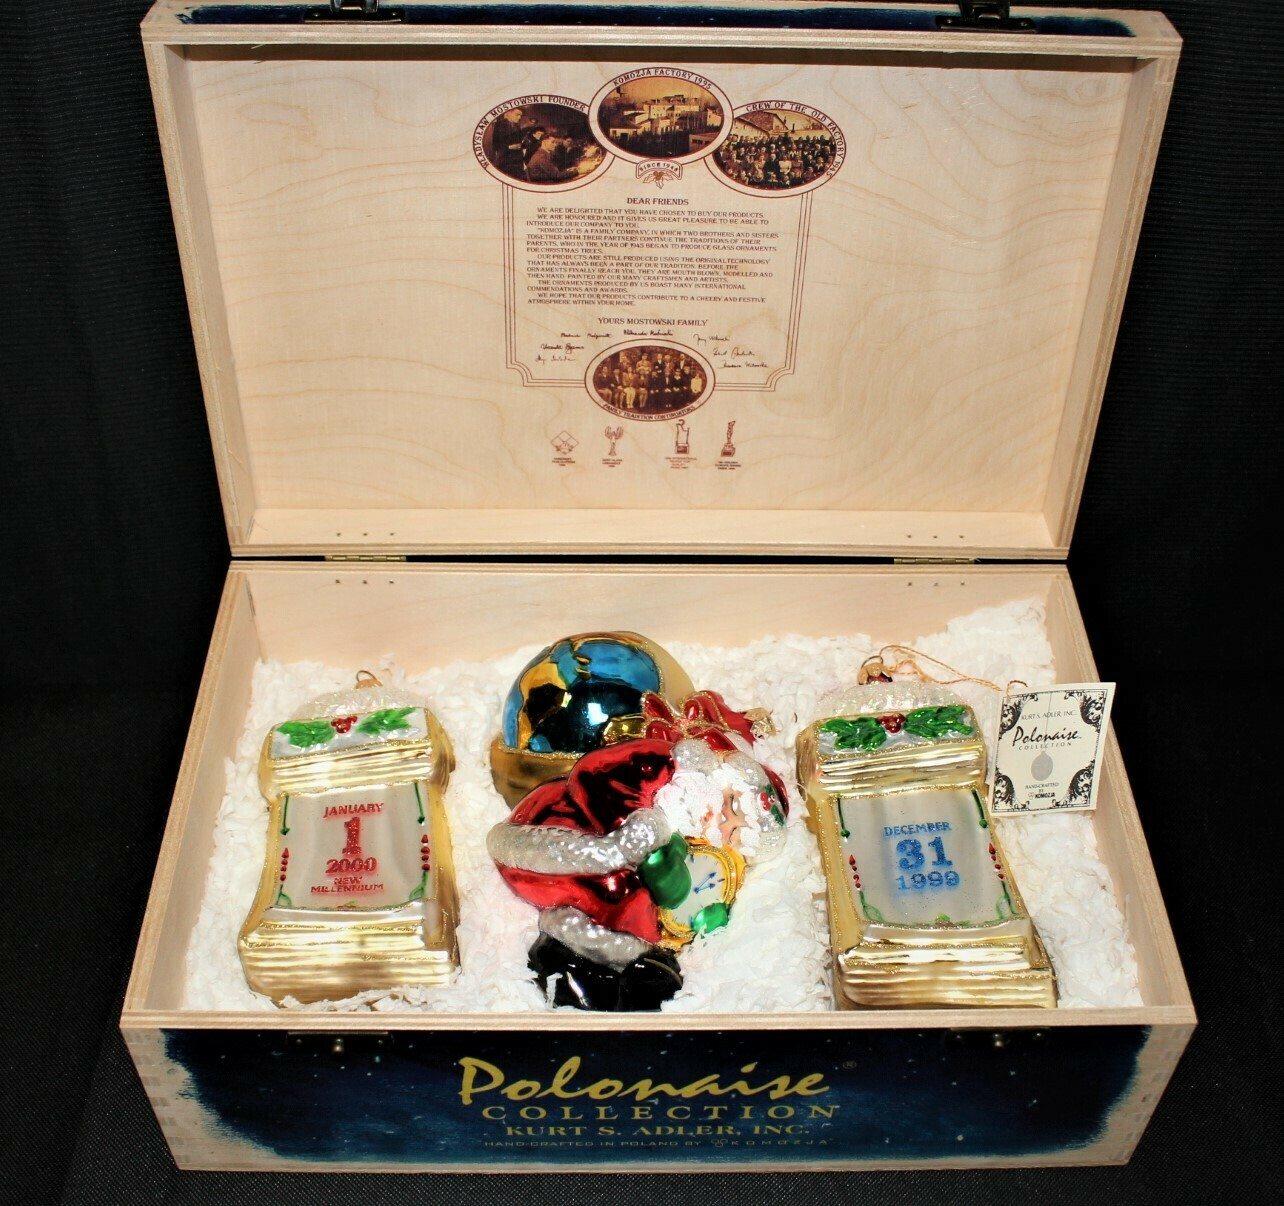 Polonaise Collection Millennium 2000 Glass Ornaments by Kurt S. Alder in Wood Box